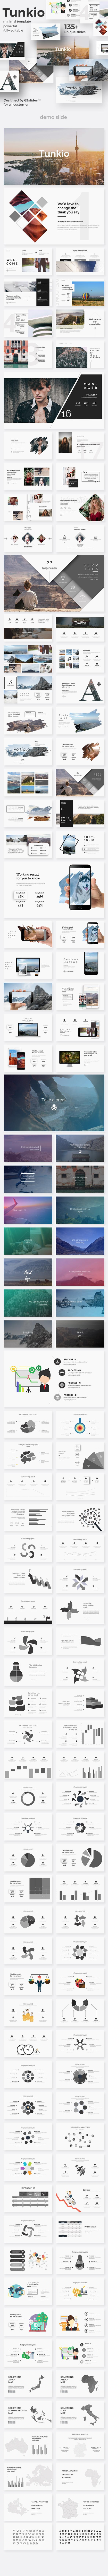 Tunkio Creative Google Slide Template - Google Slides Presentation Templates